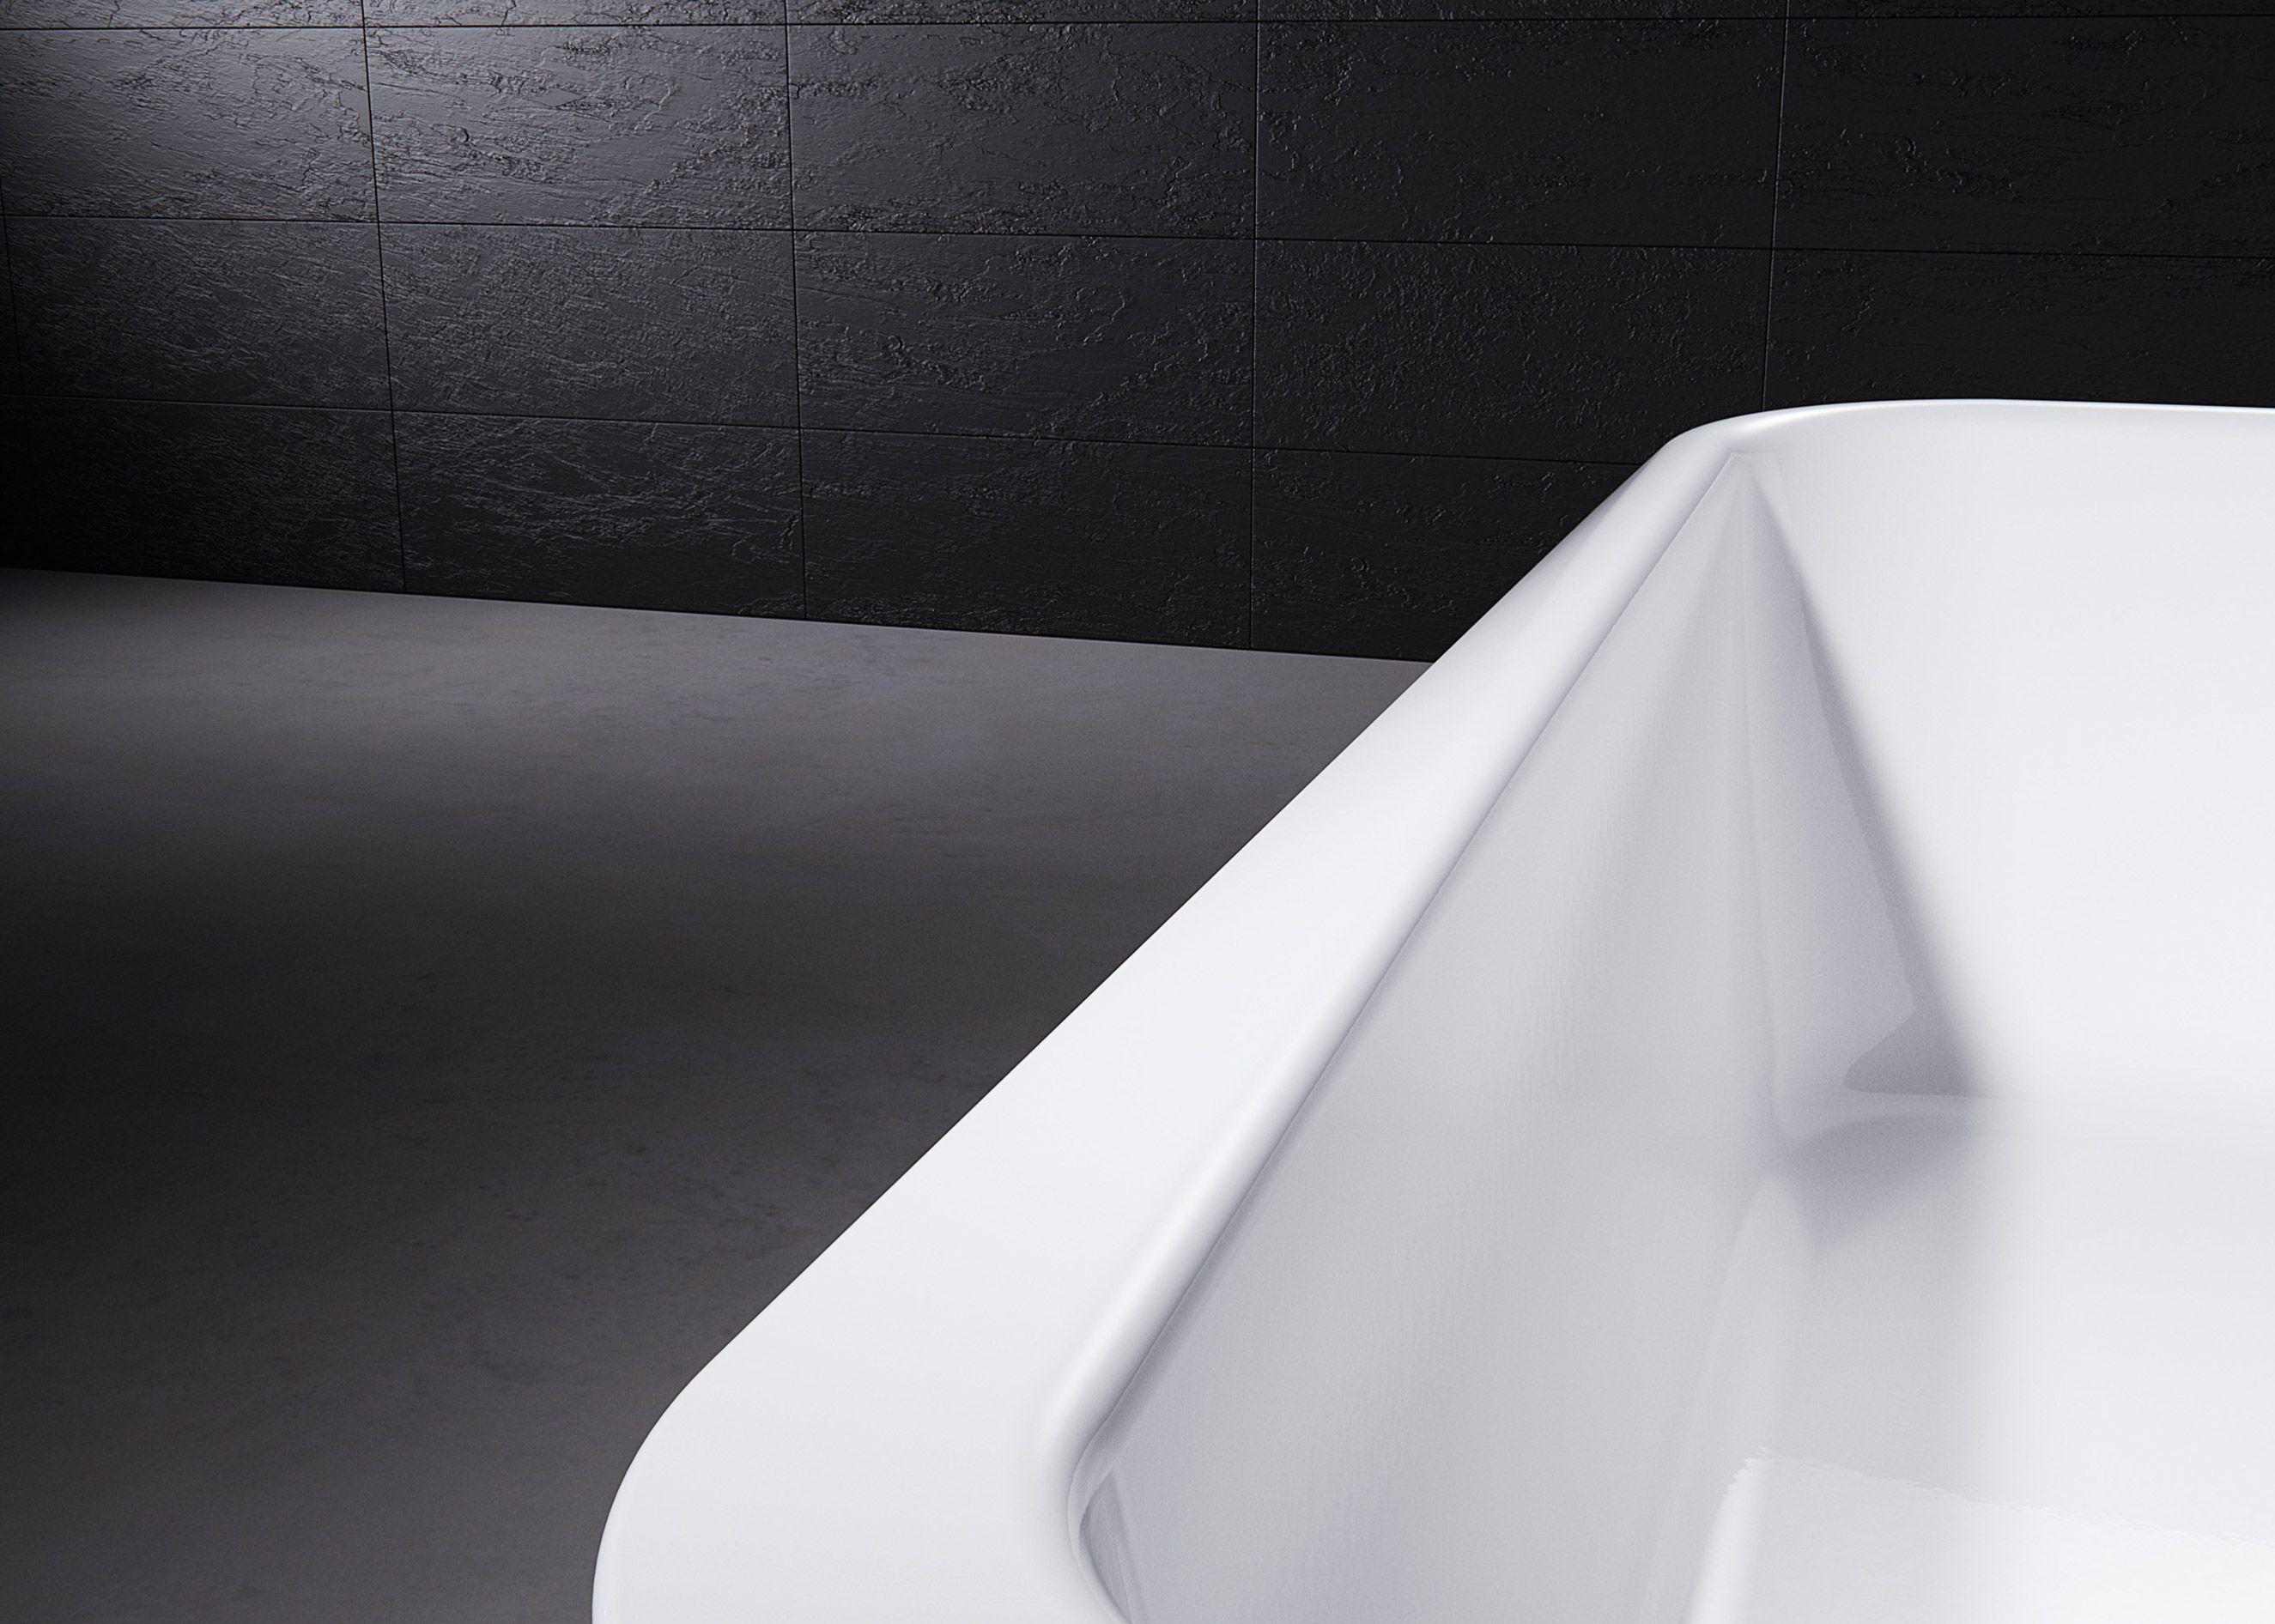 3d Cgi By Graphic Group Full Cgi 3d Visualisation Interieur Badezimmer Bathroom Innenarchitektur Raumplanung Baddesign Bade Badewanne Kaldewei Badezimmer